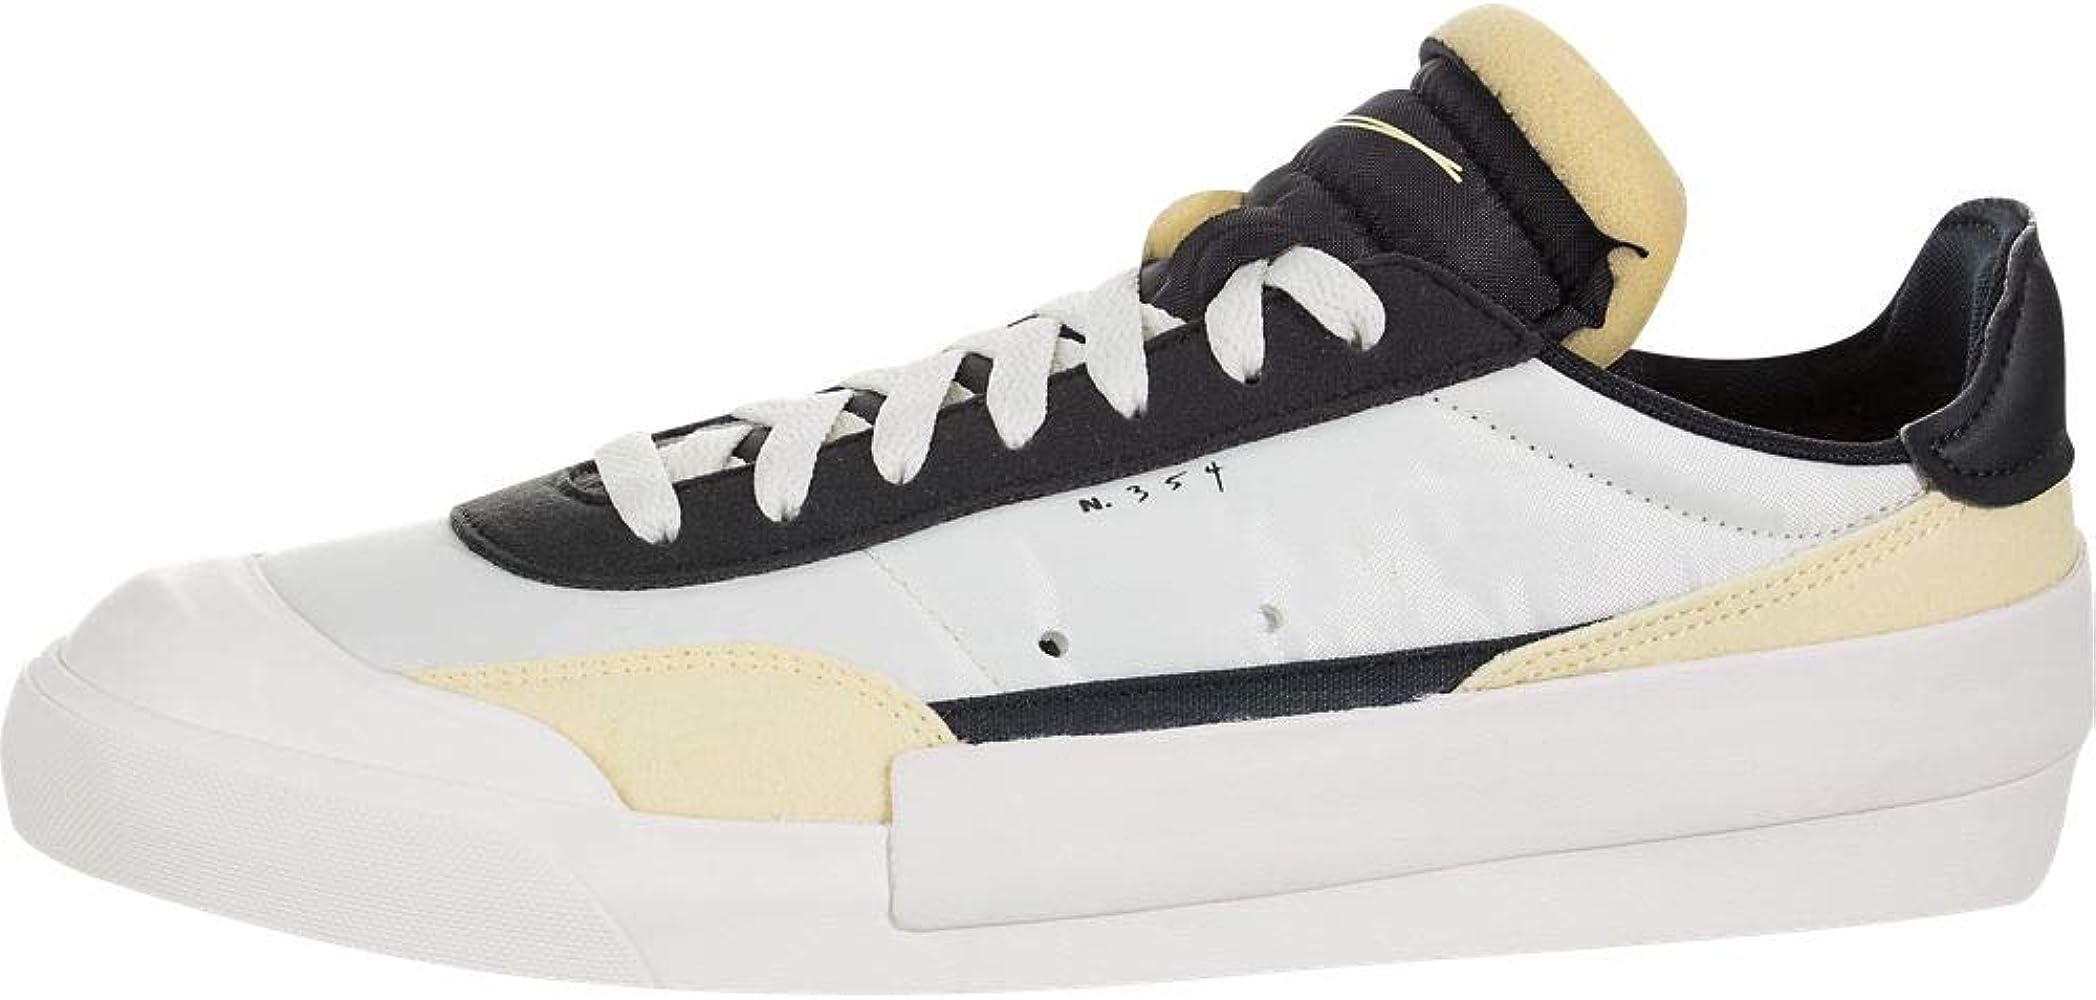 Nike Drop-Type Lx Mens Av6697-101 Size